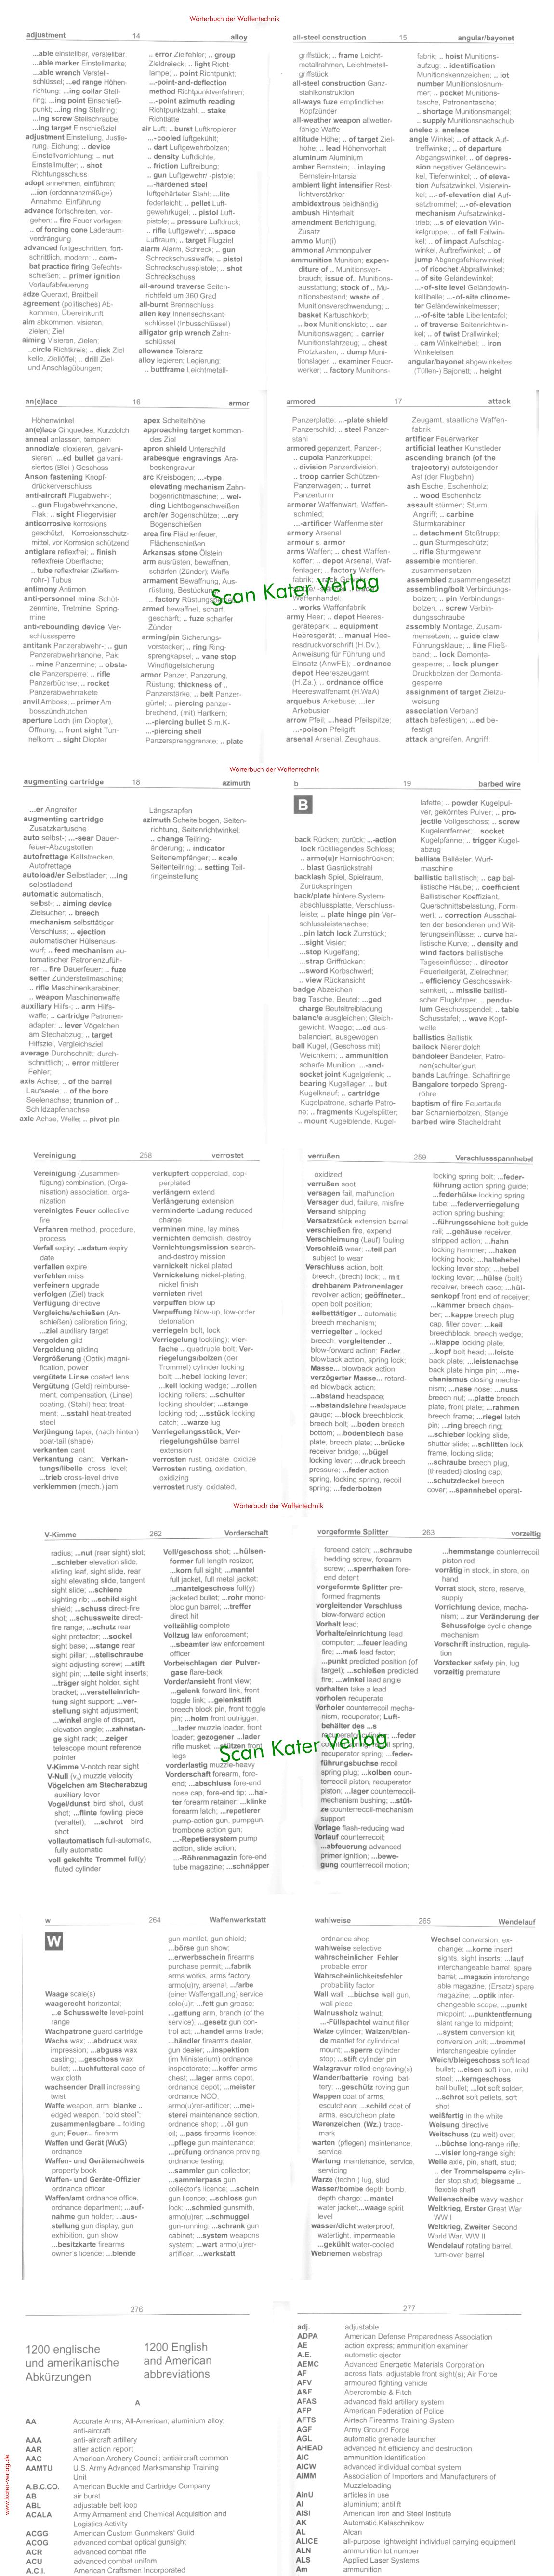 Wörterbuch der Waffentechnik EN-DE, DE-EN